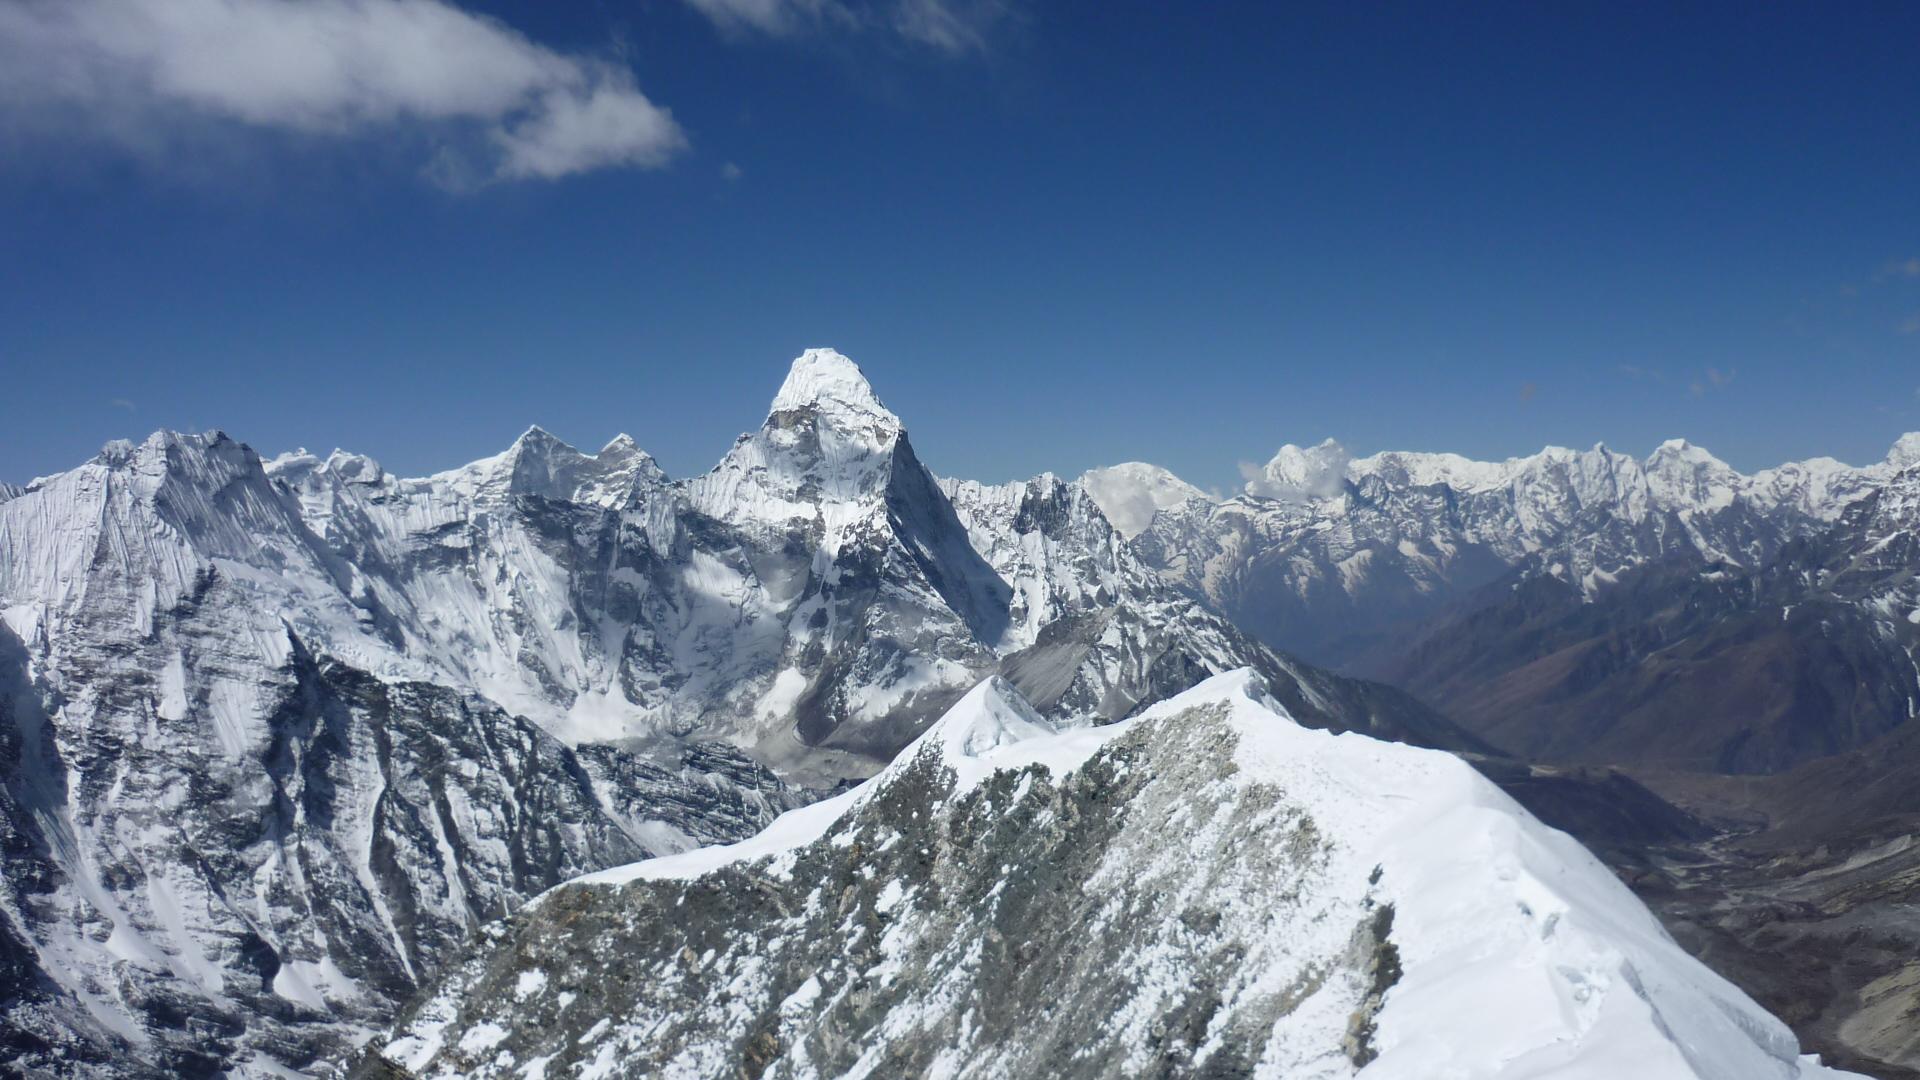 island peak with khumbu traverse- discover himalayan treks